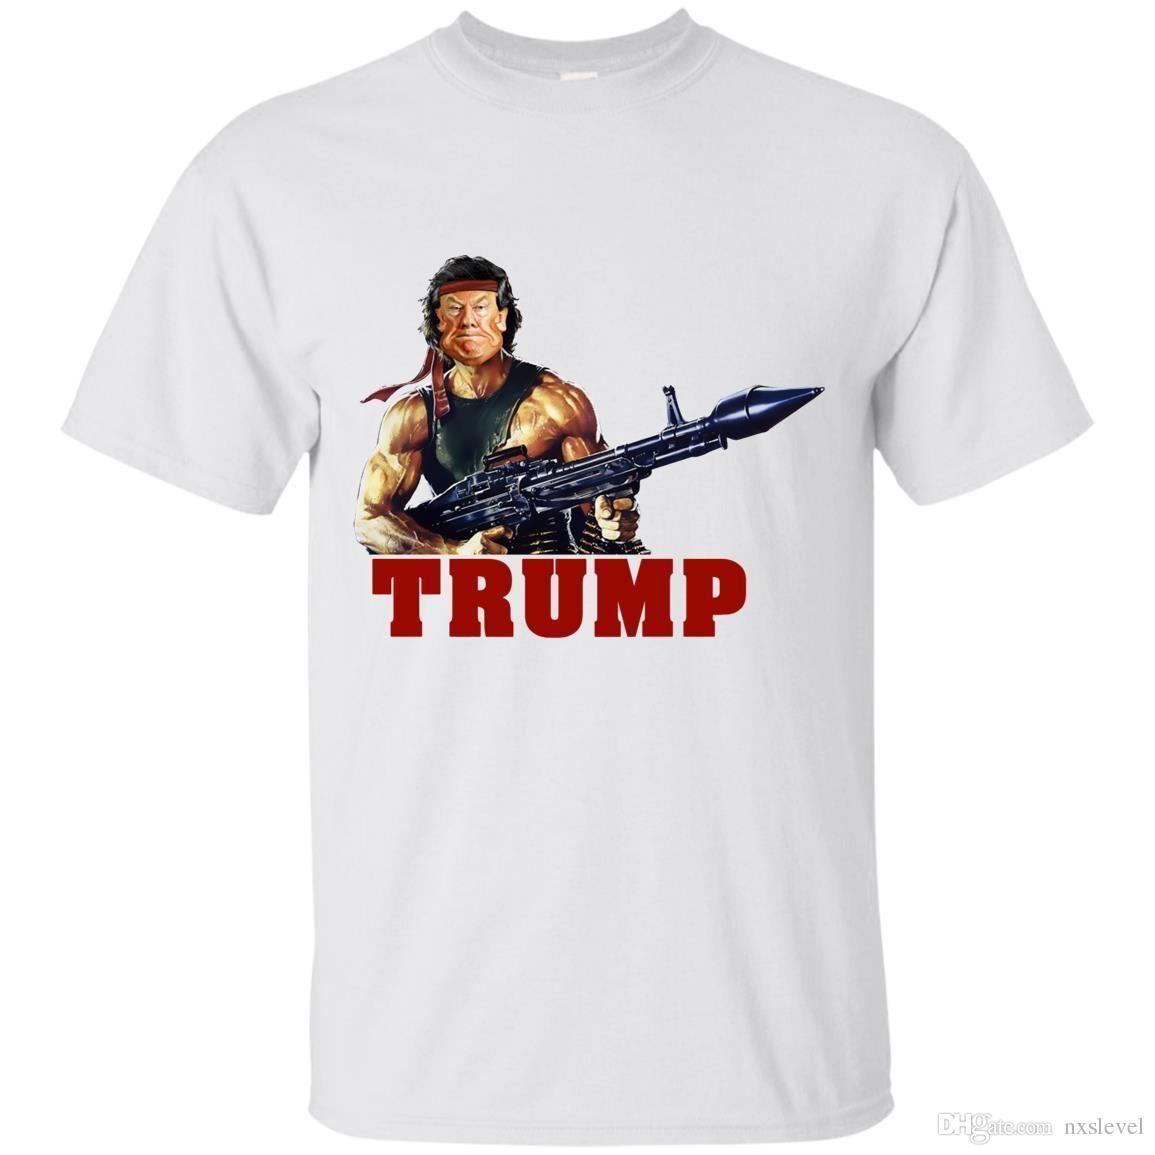 1c0d97d76 White Funny Donald Trump Rambo T-Shirt Support Trump 2020 Men's Clothing  S-4XL